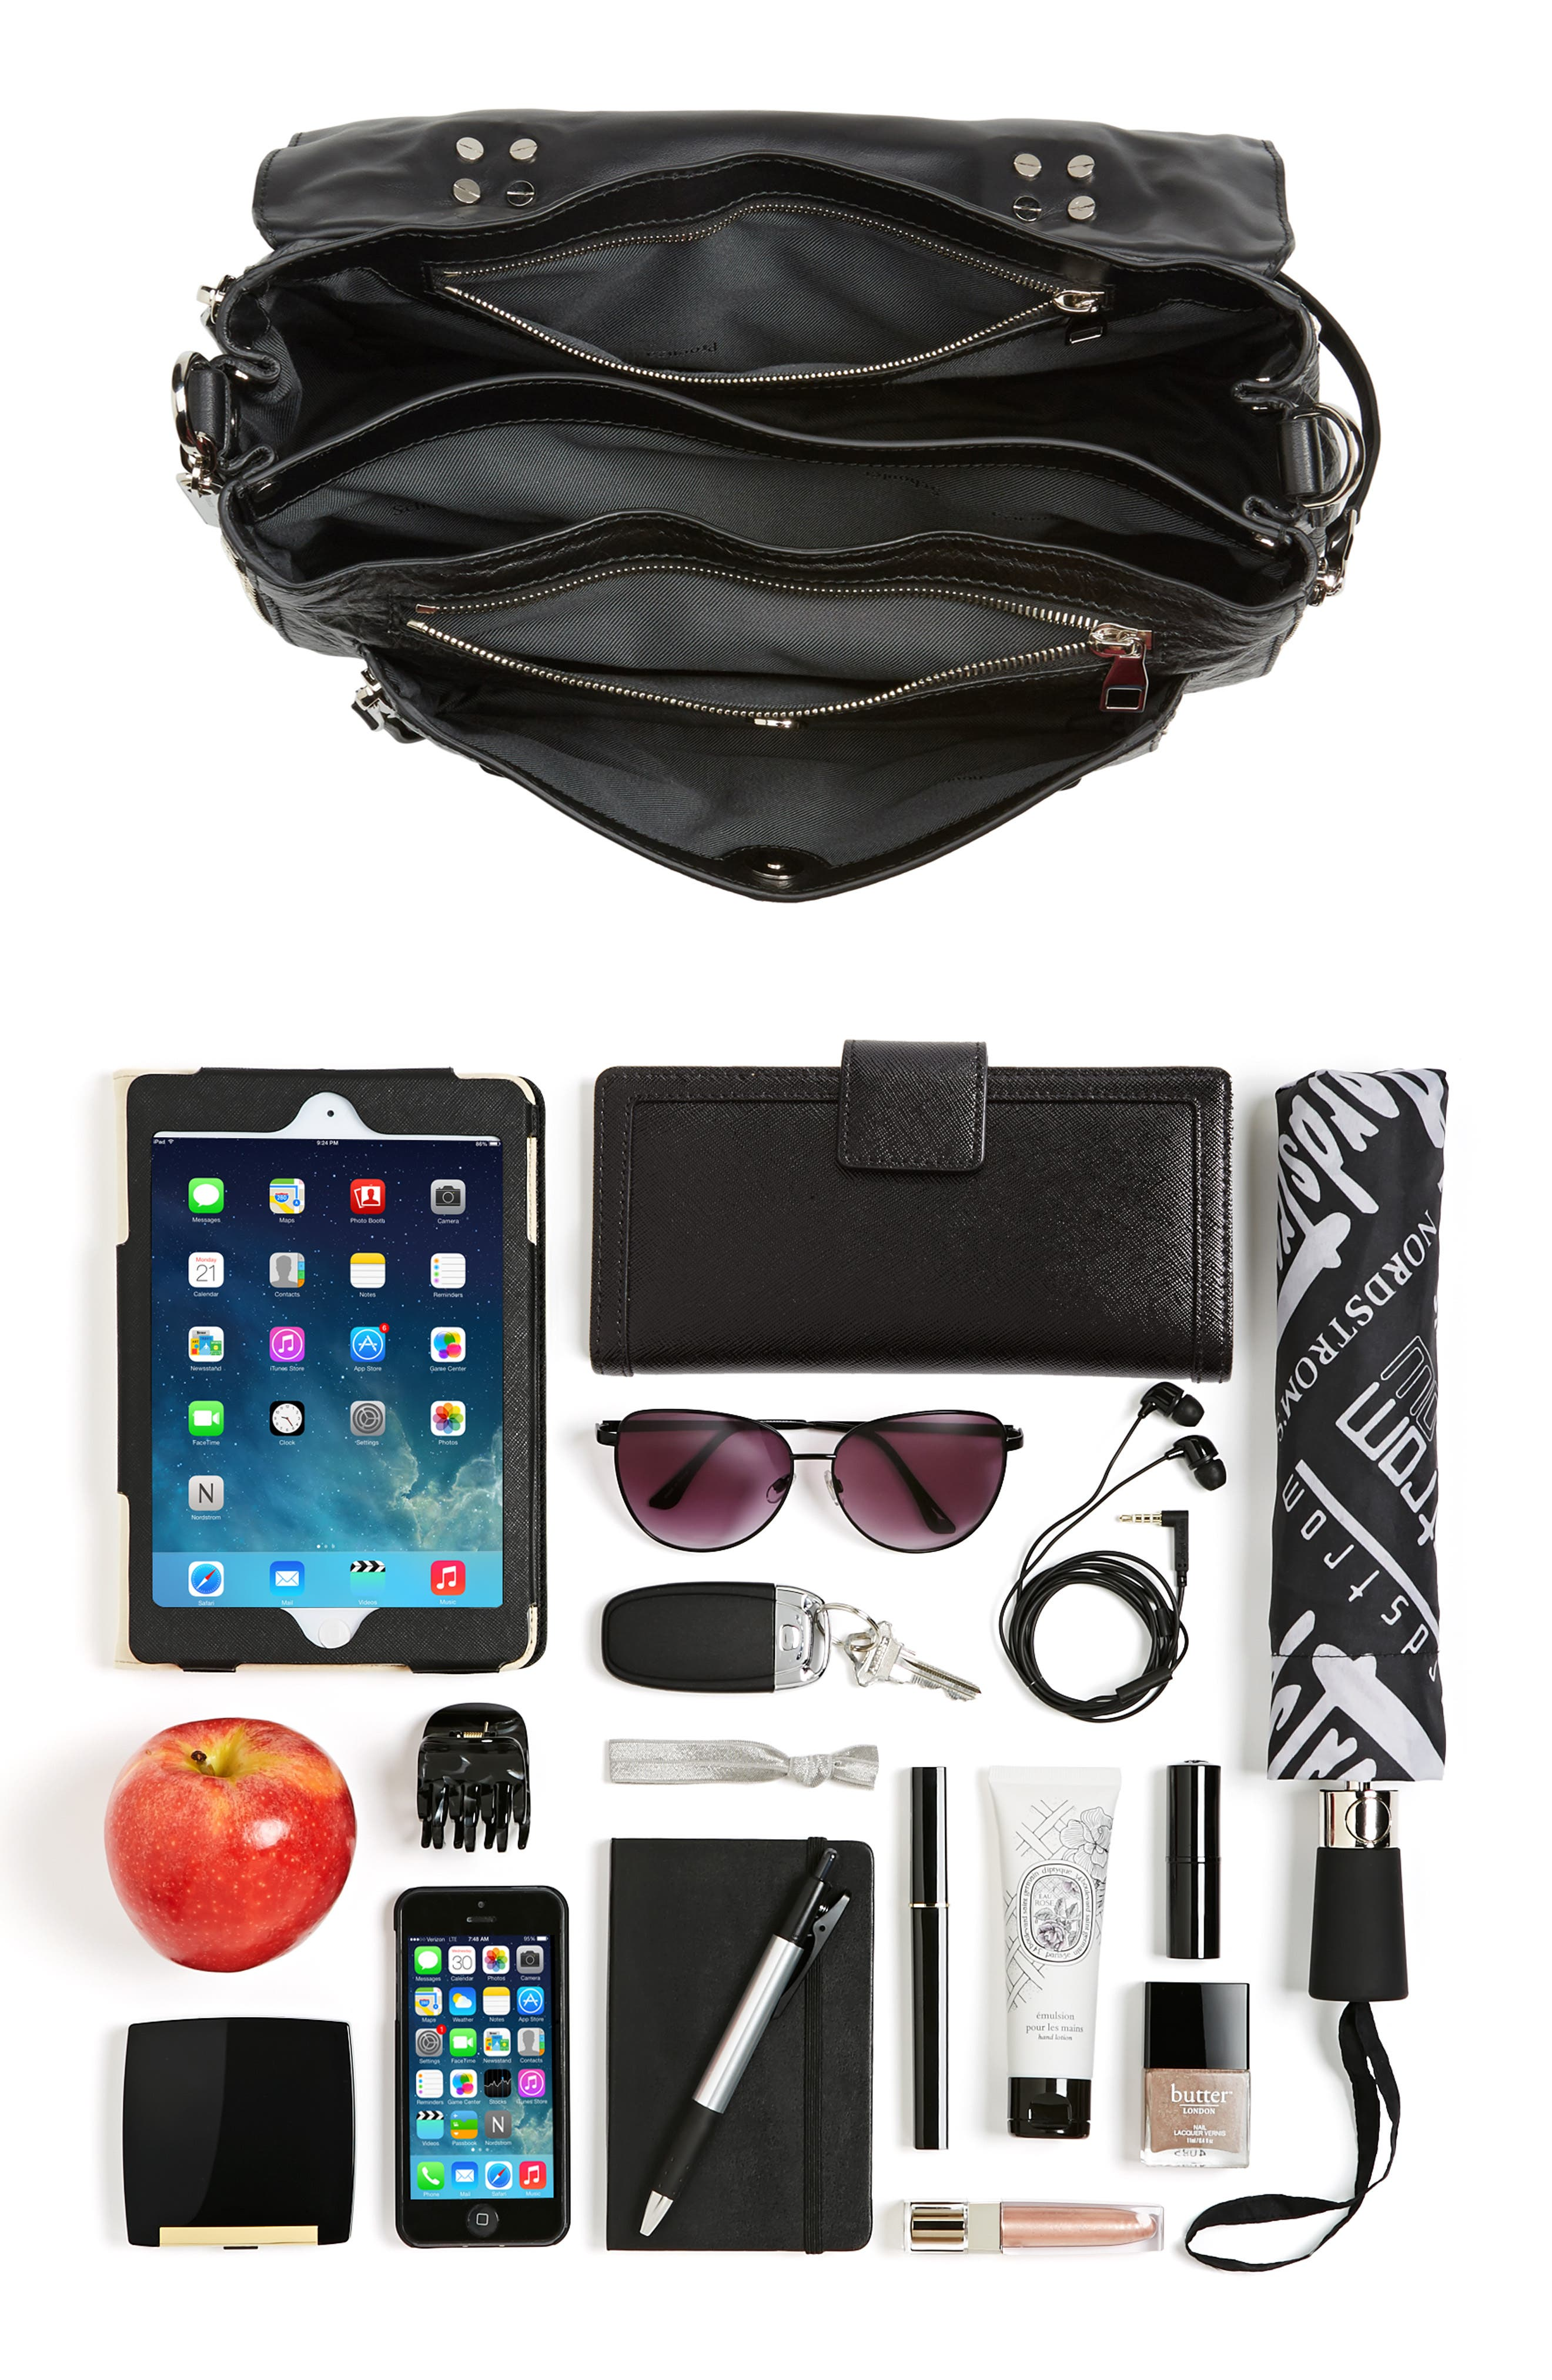 Medium PS1 Paper Leather Satchel,                             Alternate thumbnail 7, color,                             BLACK